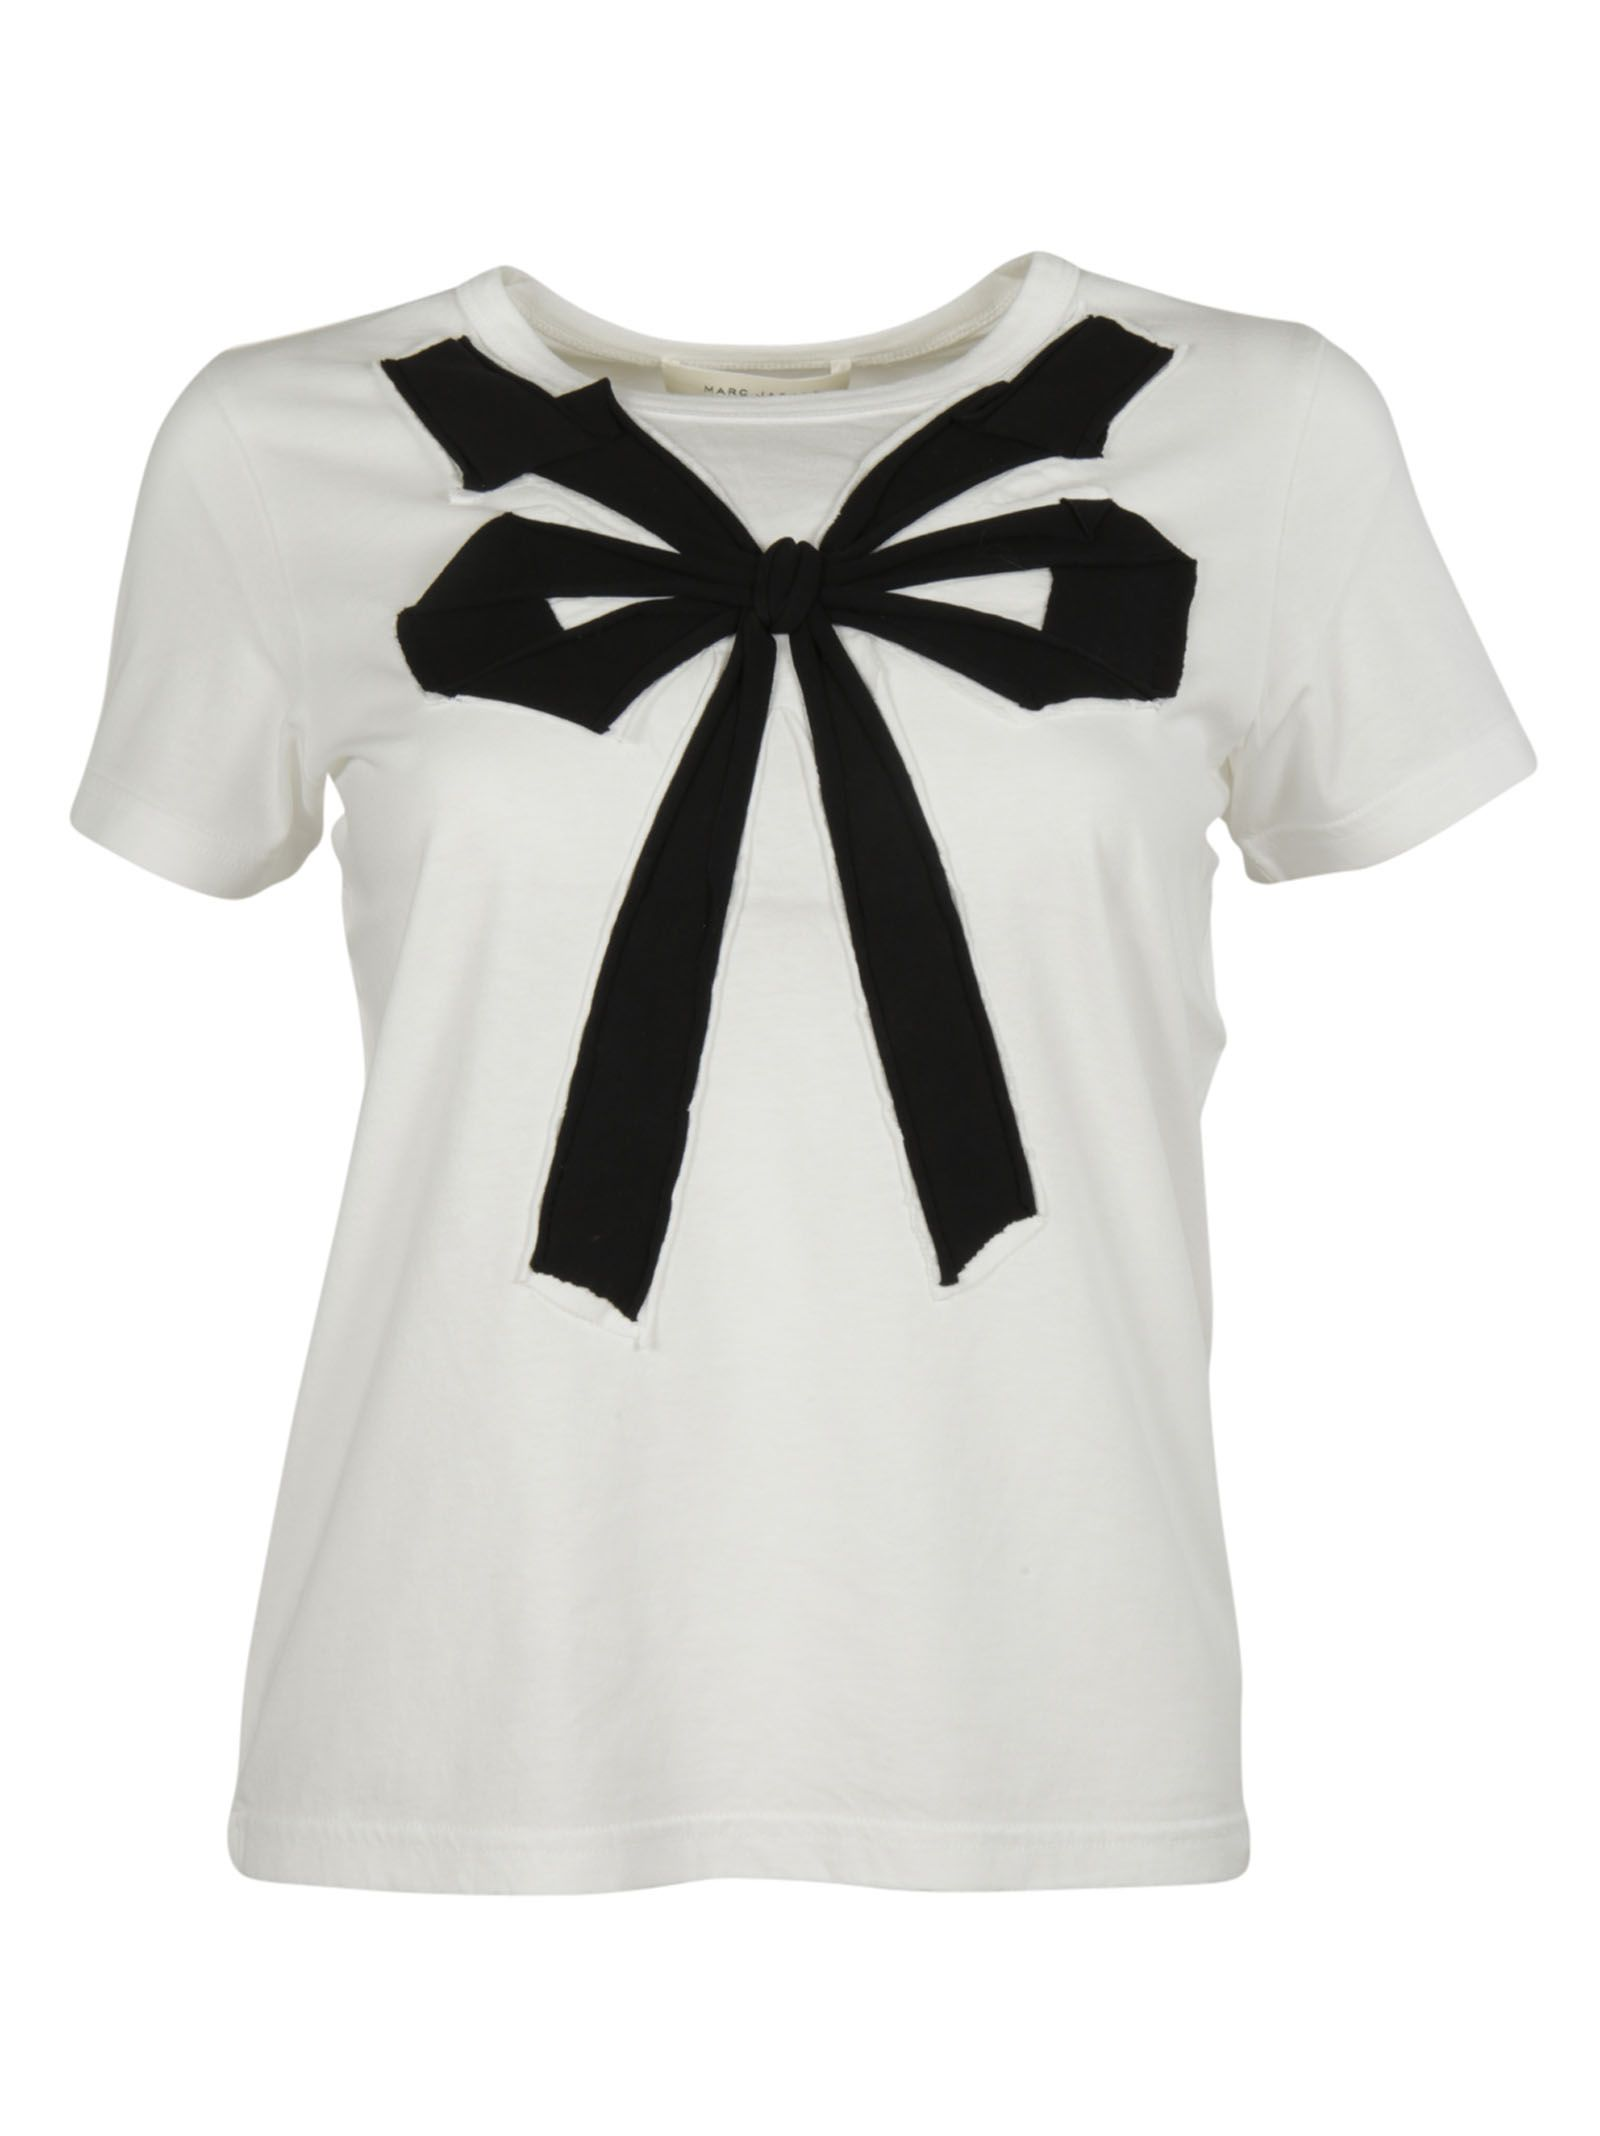 marc jacobs female 45883 white multi bow embroidery tshirt